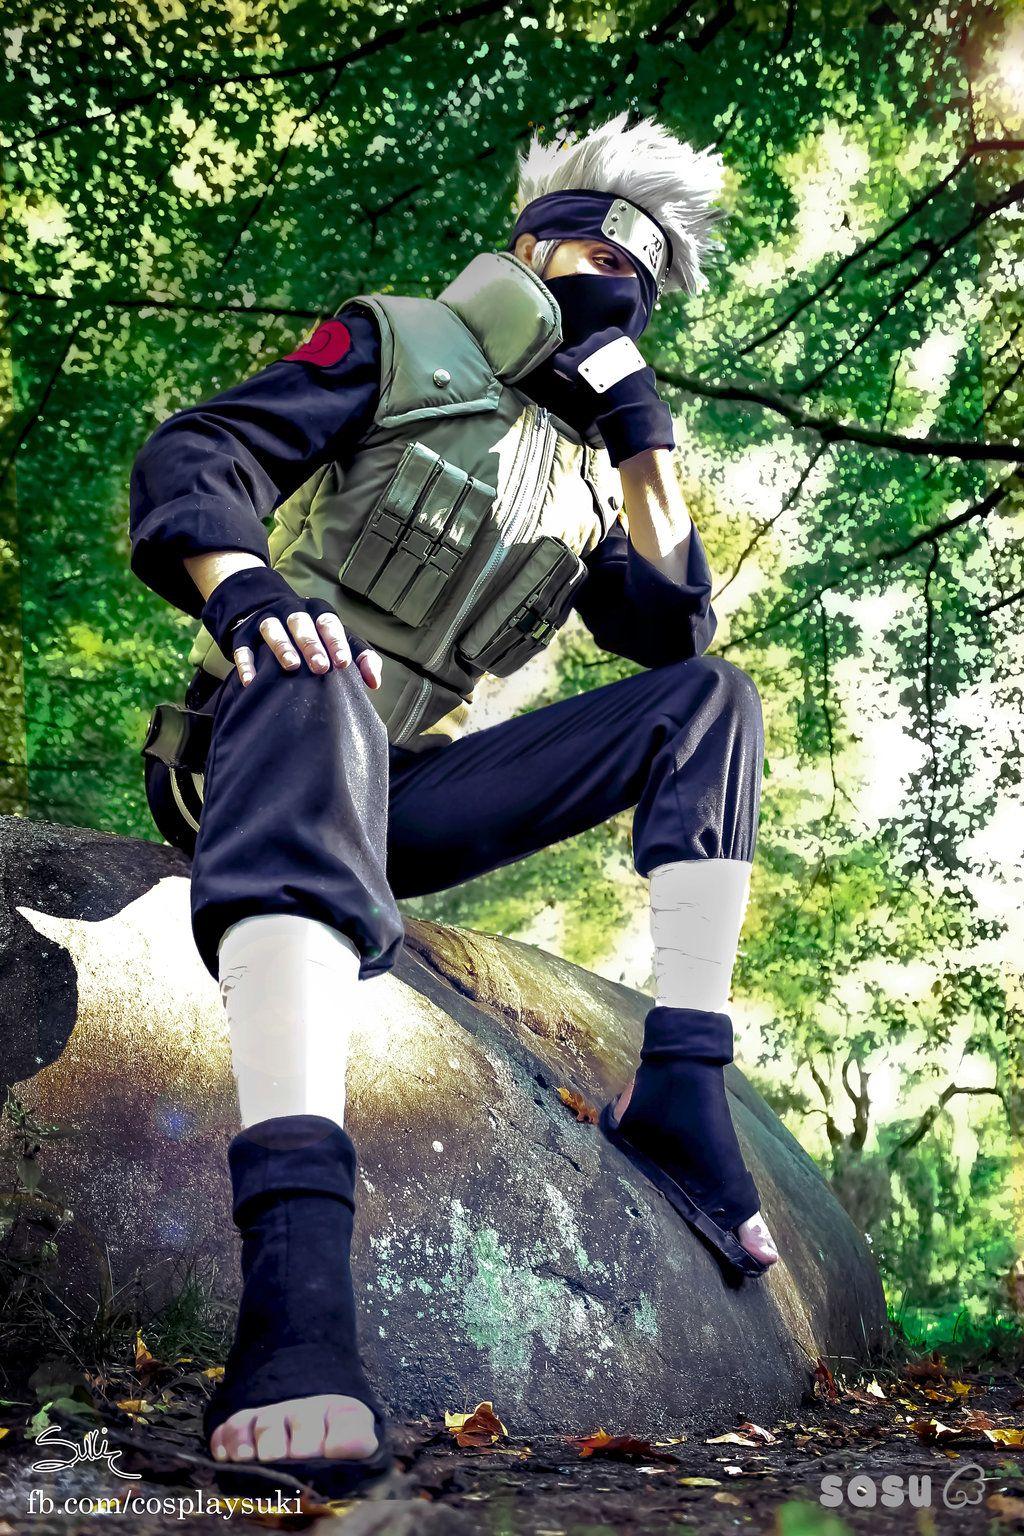 Omoshiro by sukicosplay on deviantart manga cosplay